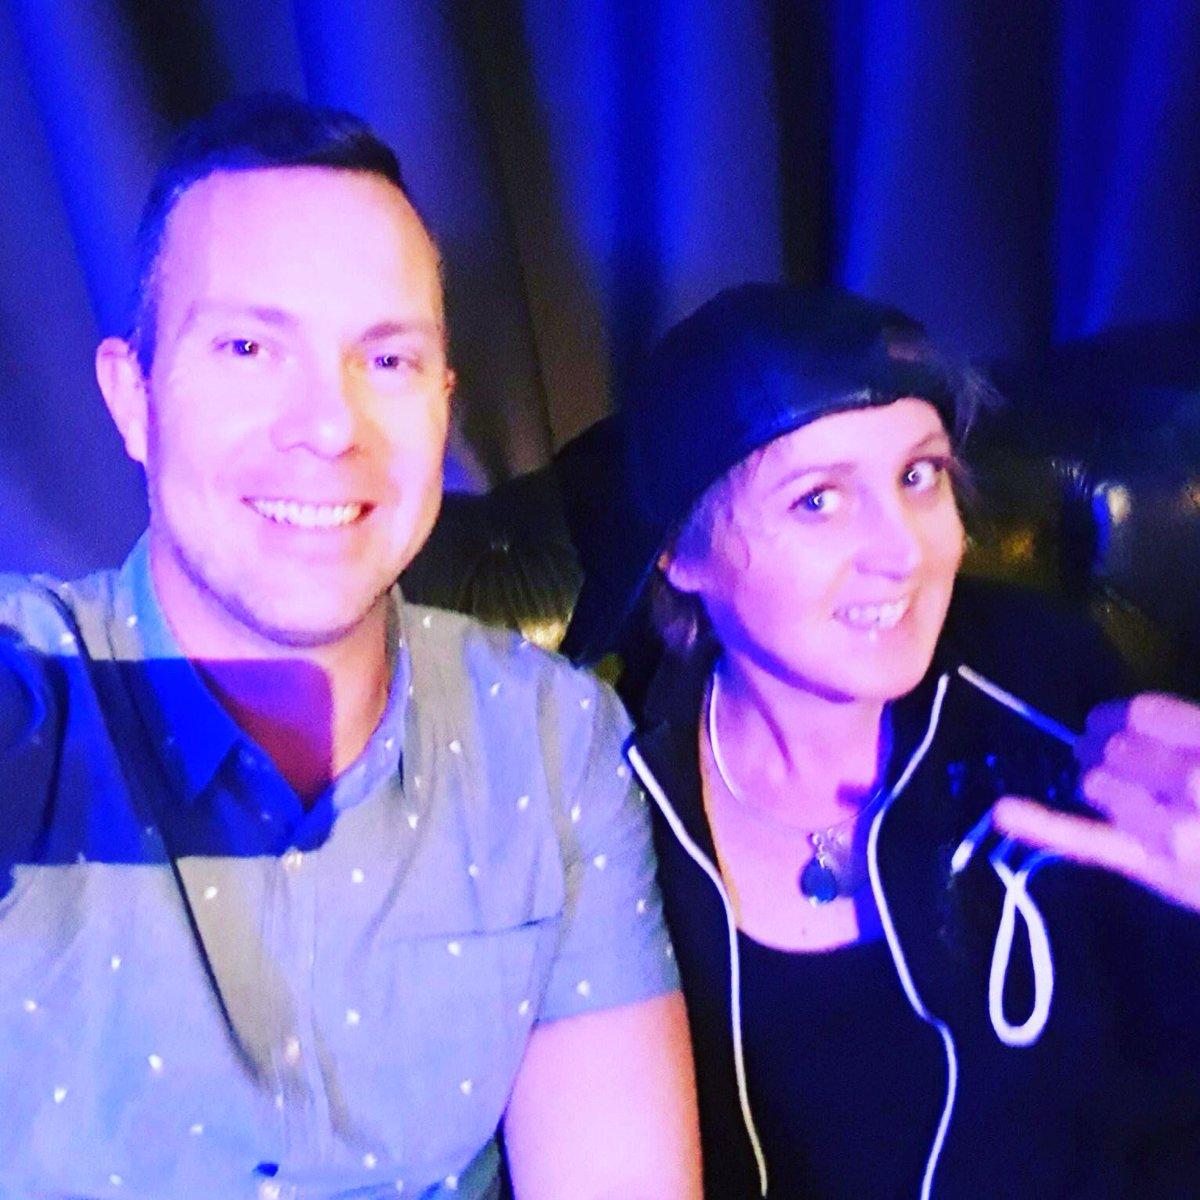 Sitting back after a set wit Smokinjoe! #Drift #rnb #chillin #dj #music #goodvibes #Ziamusic #Zia #goodtimes #weekend #dance<br>http://pic.twitter.com/fMktVpOzJV